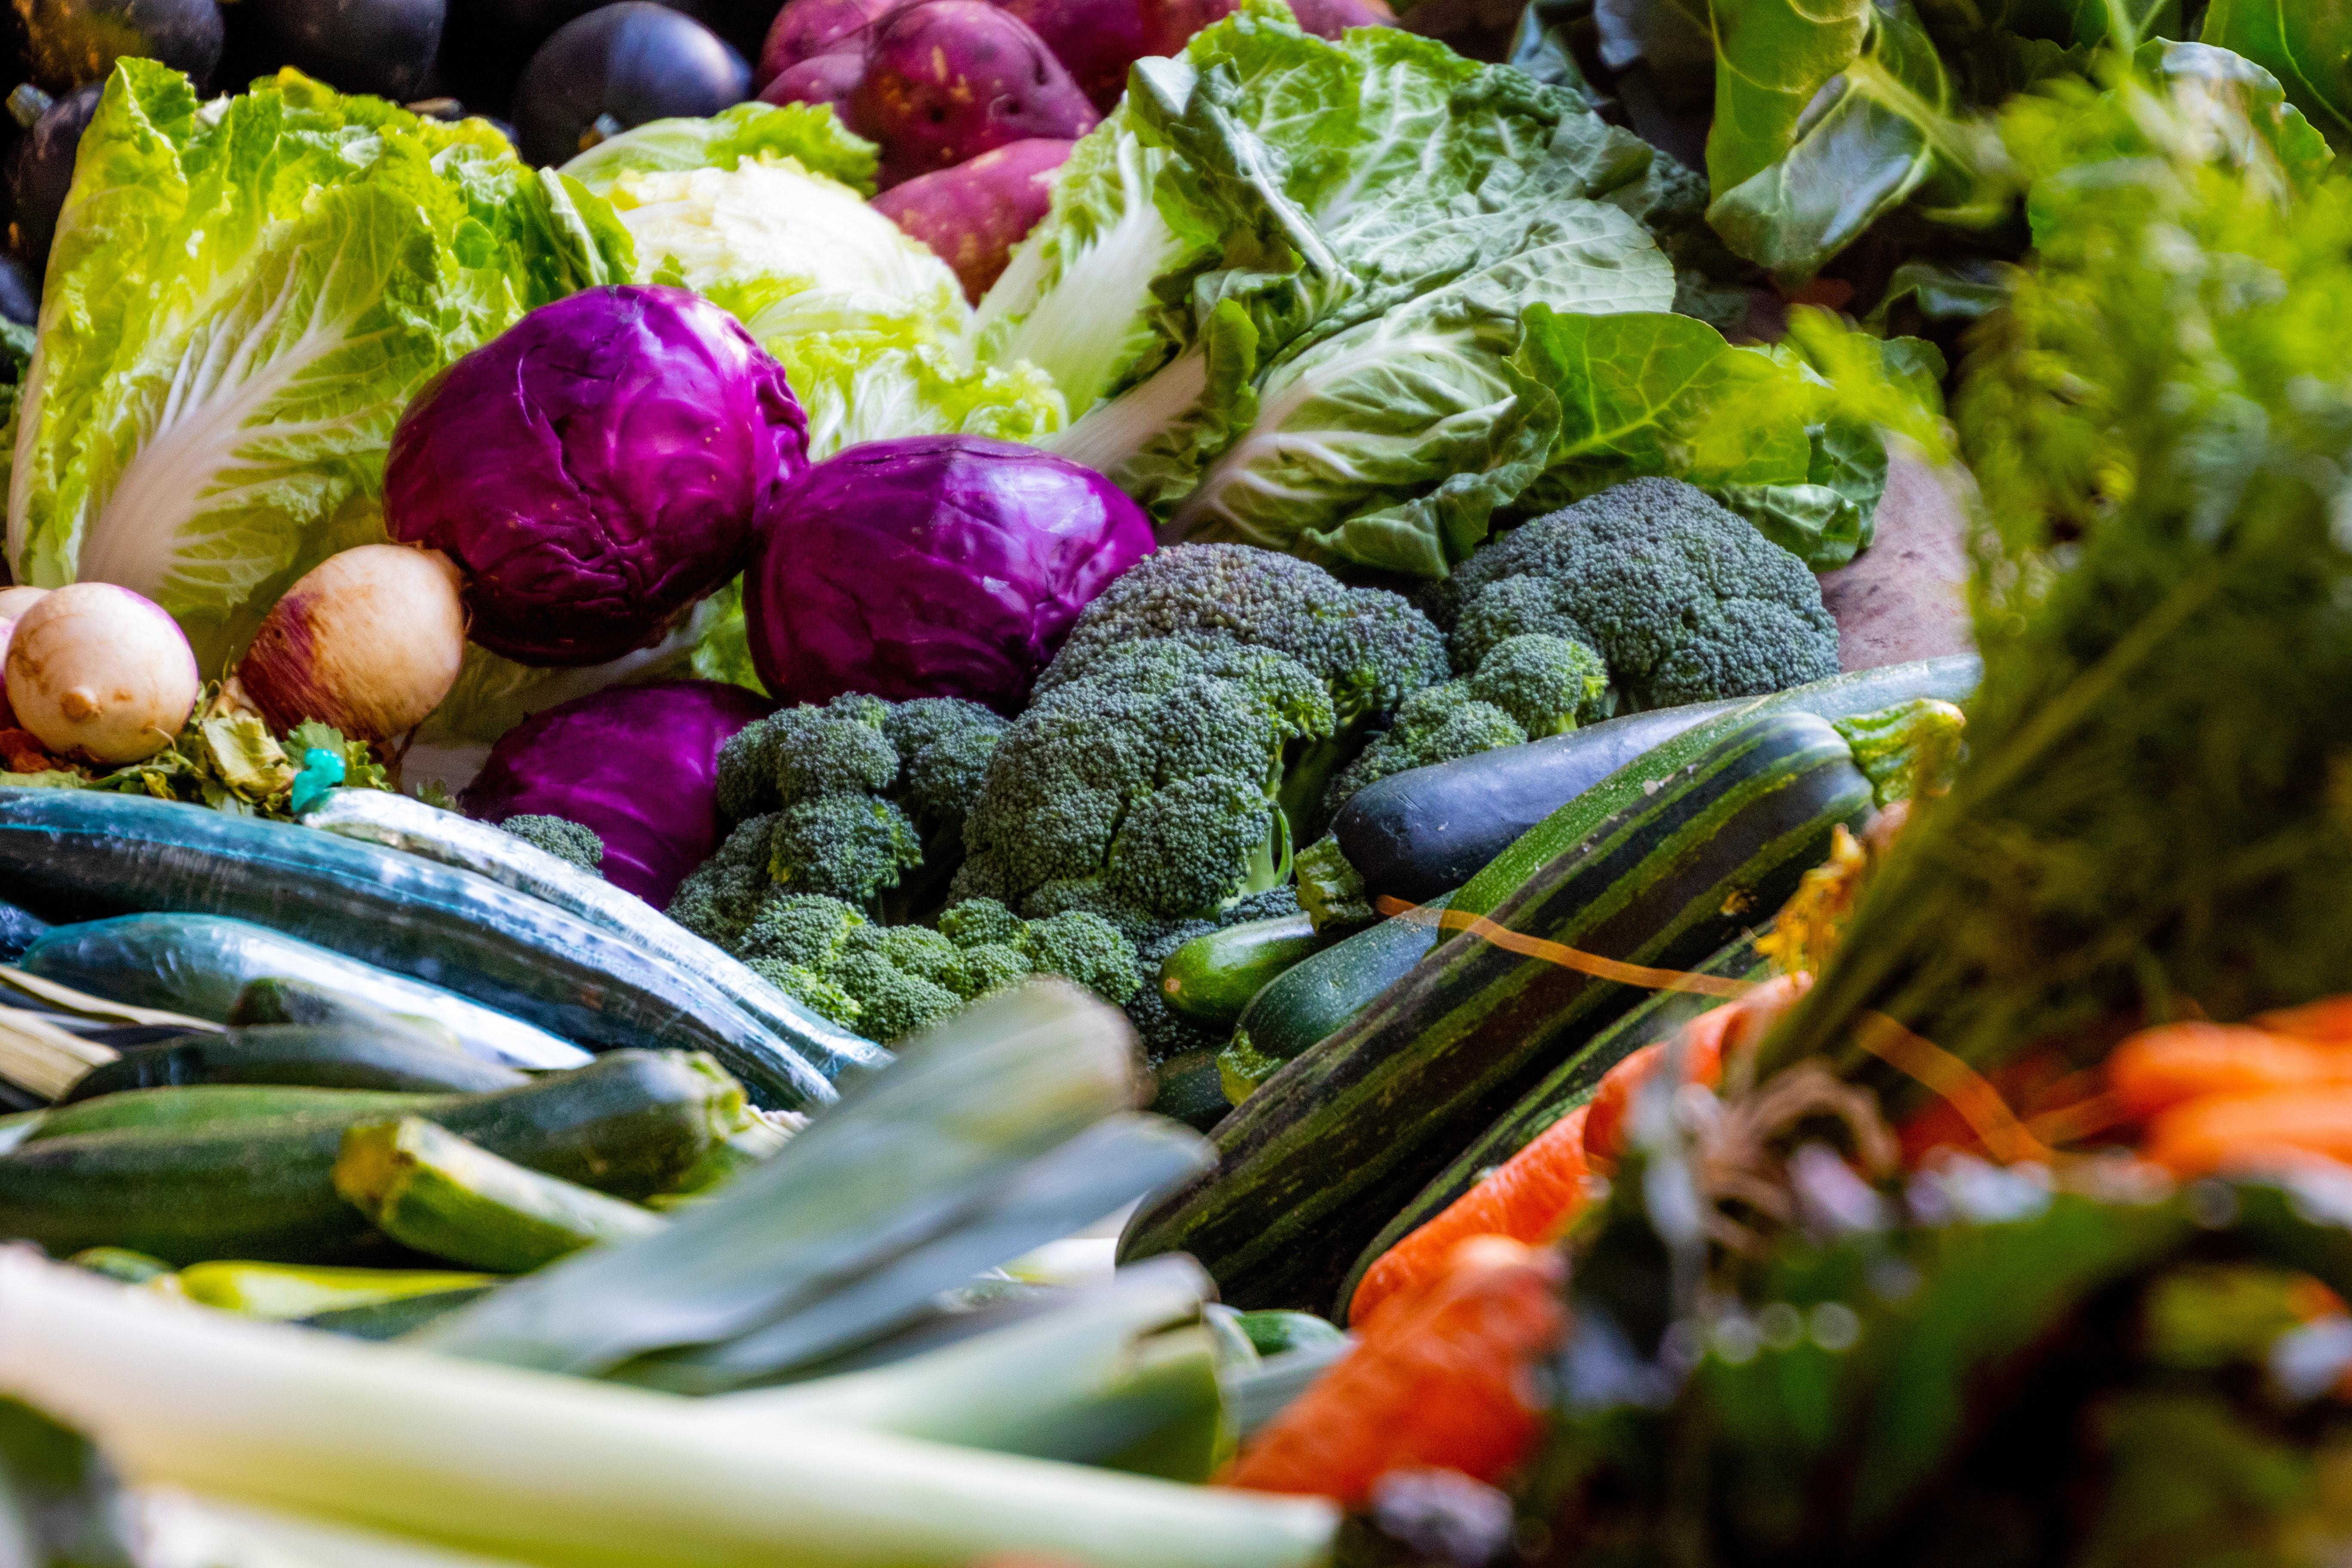 Vegetables. Source: Pexels.